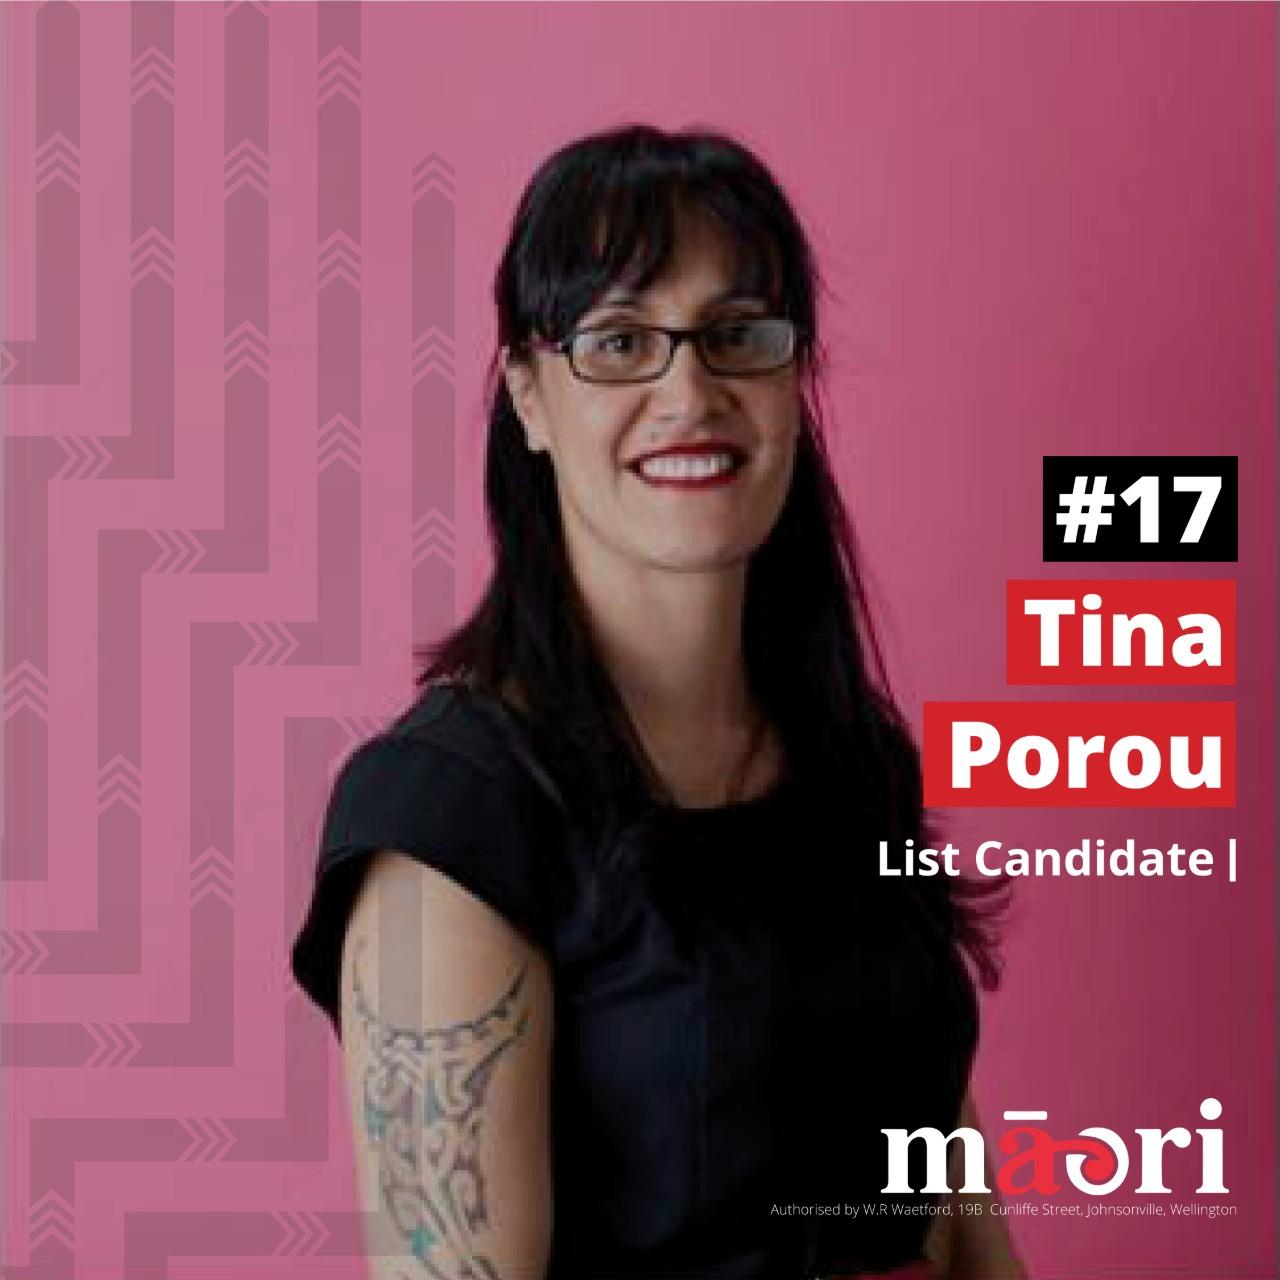 Tina Porou, List Candidate